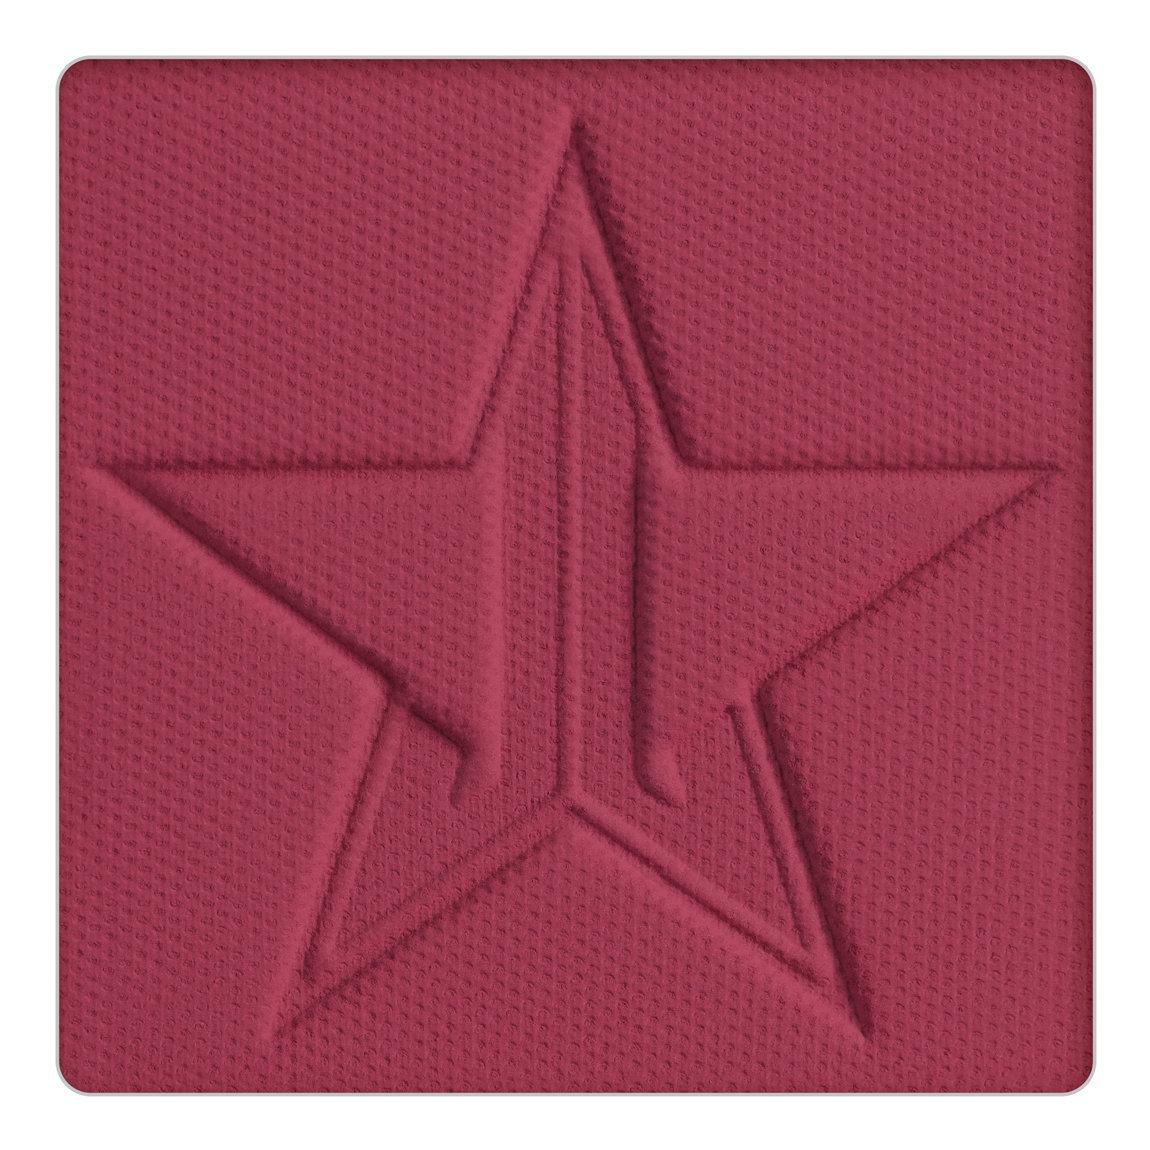 Jeffree Star Cosmetics Artistry Singles Fresh Meat alternative view 1.